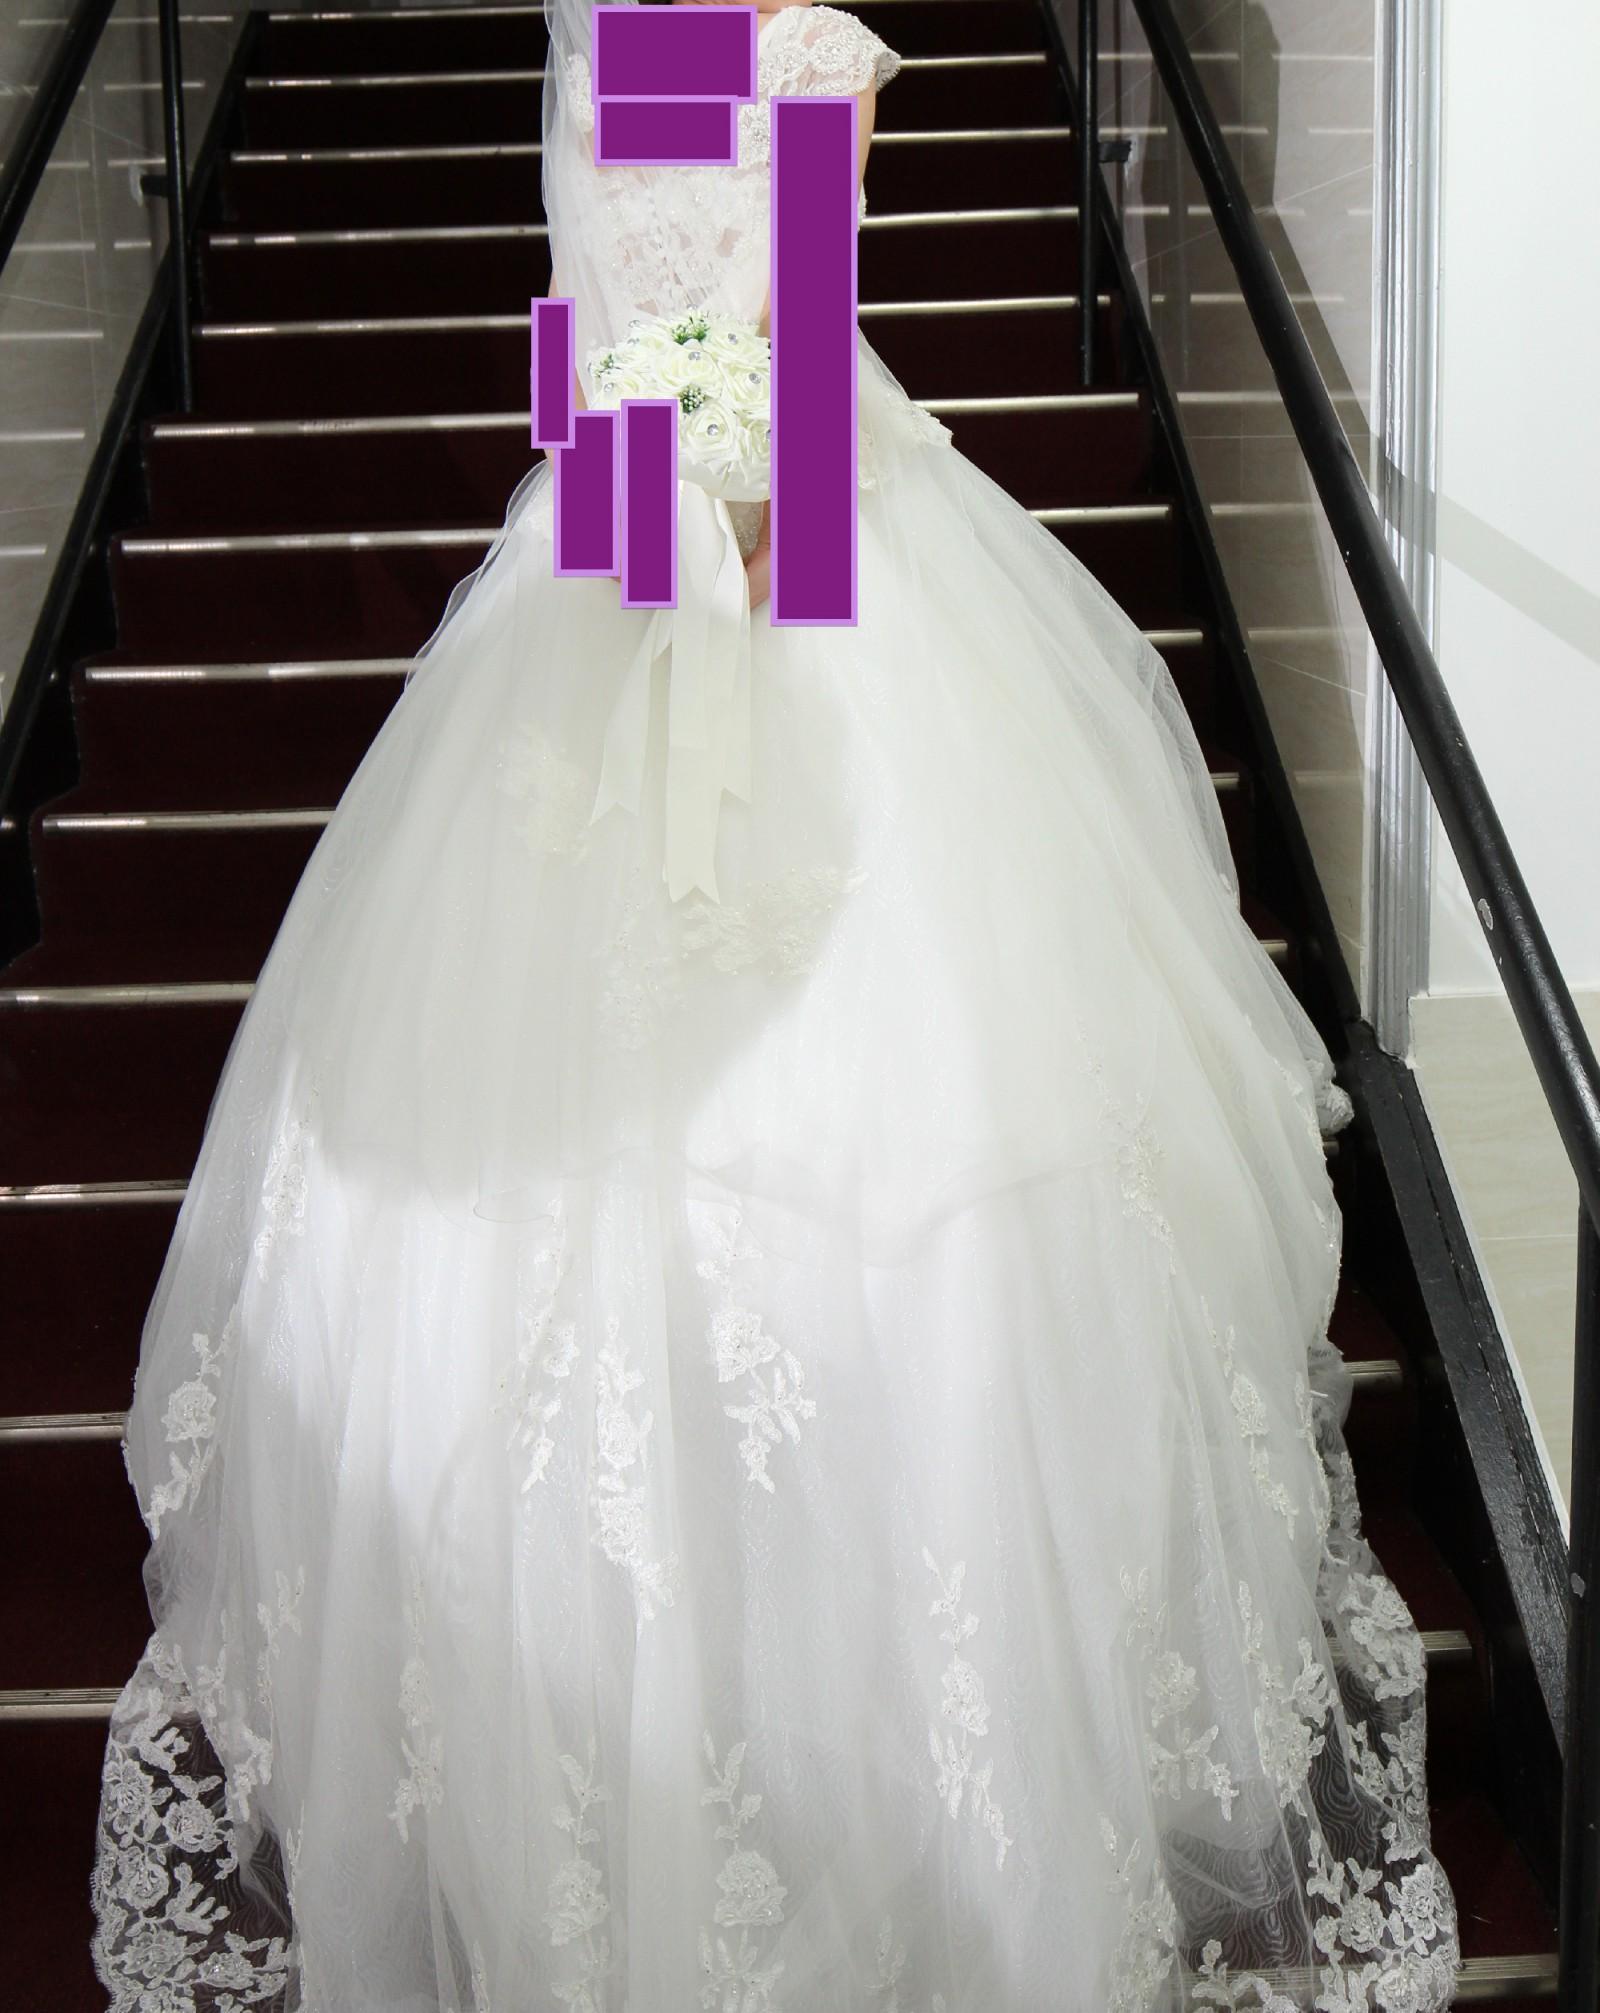 Divinity bridal second hand wedding dress on sale 70 off for Second hand wedding dresses for sale